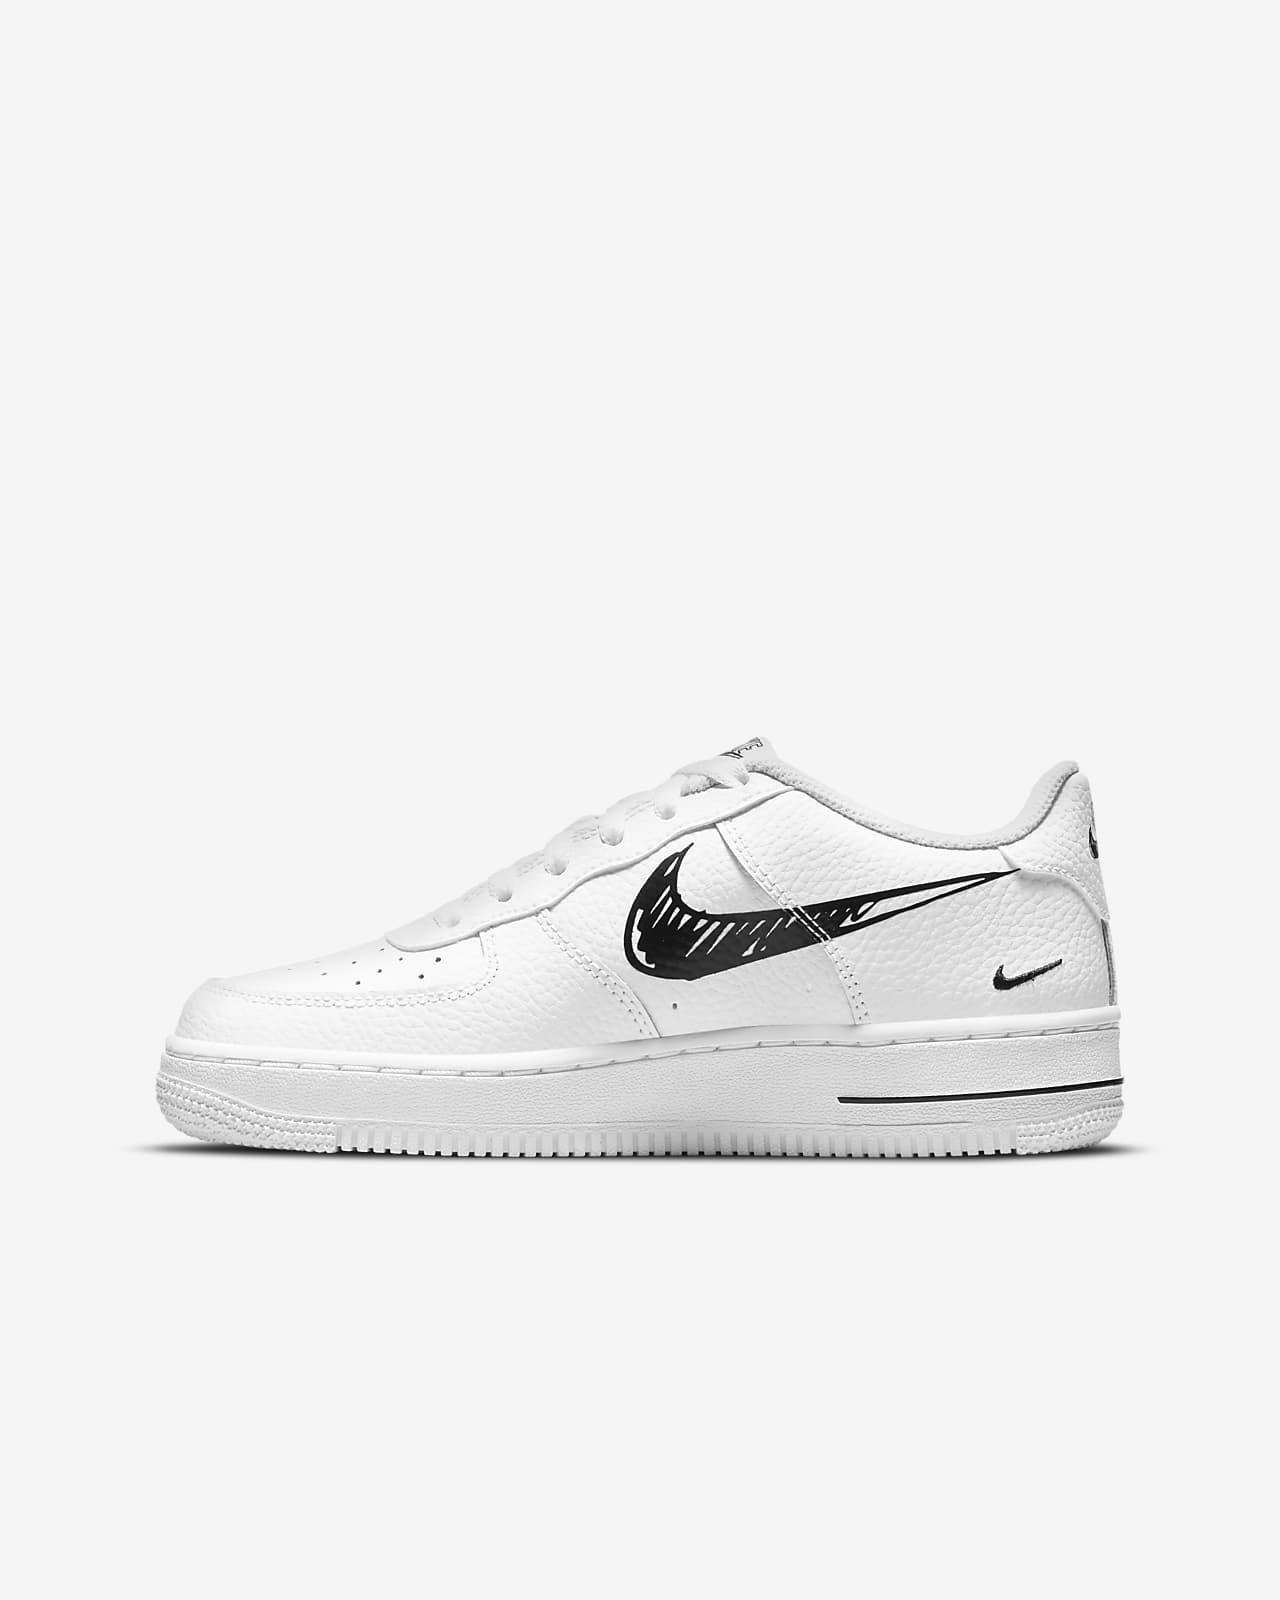 Calzado para niños talla grande Nike Air Force 1 Low